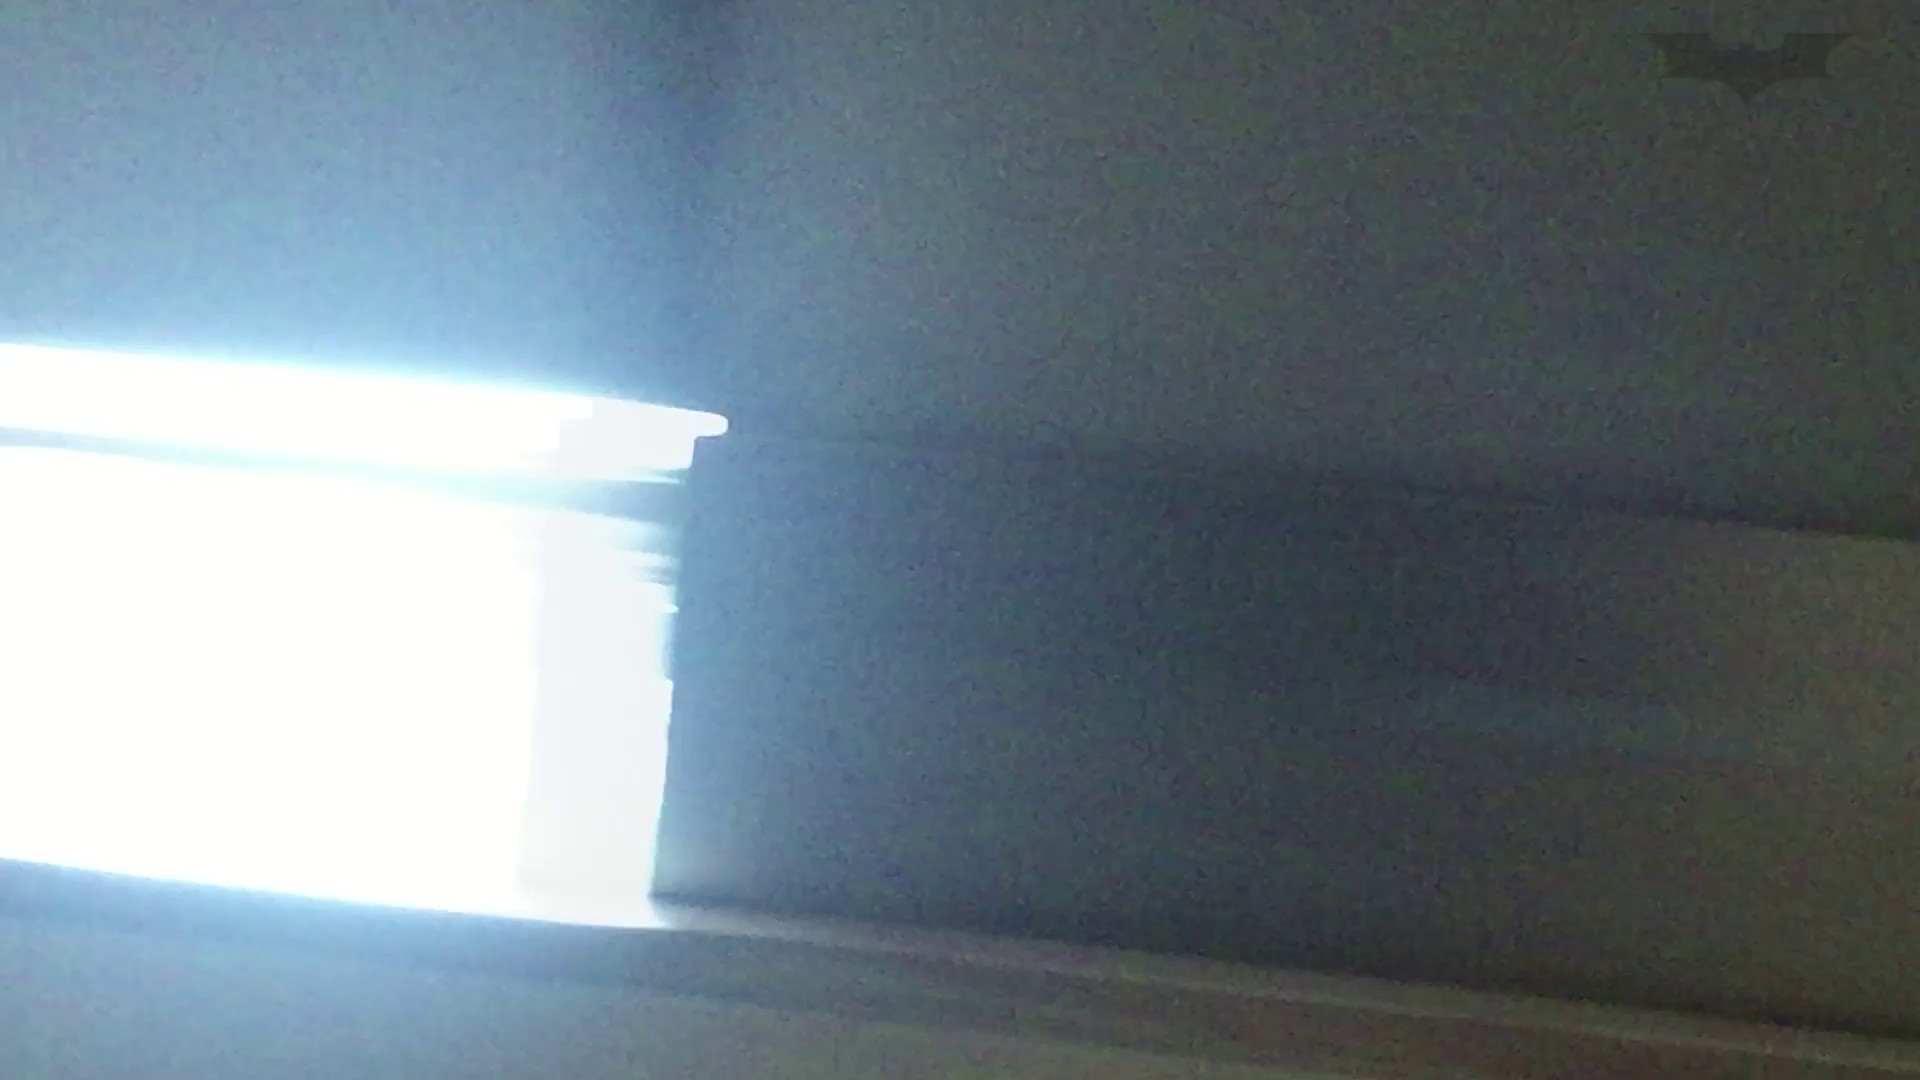 JD盗撮 美女の洗面所の秘密 Vol.66 盗撮 盗み撮り動画キャプチャ 85pic 38